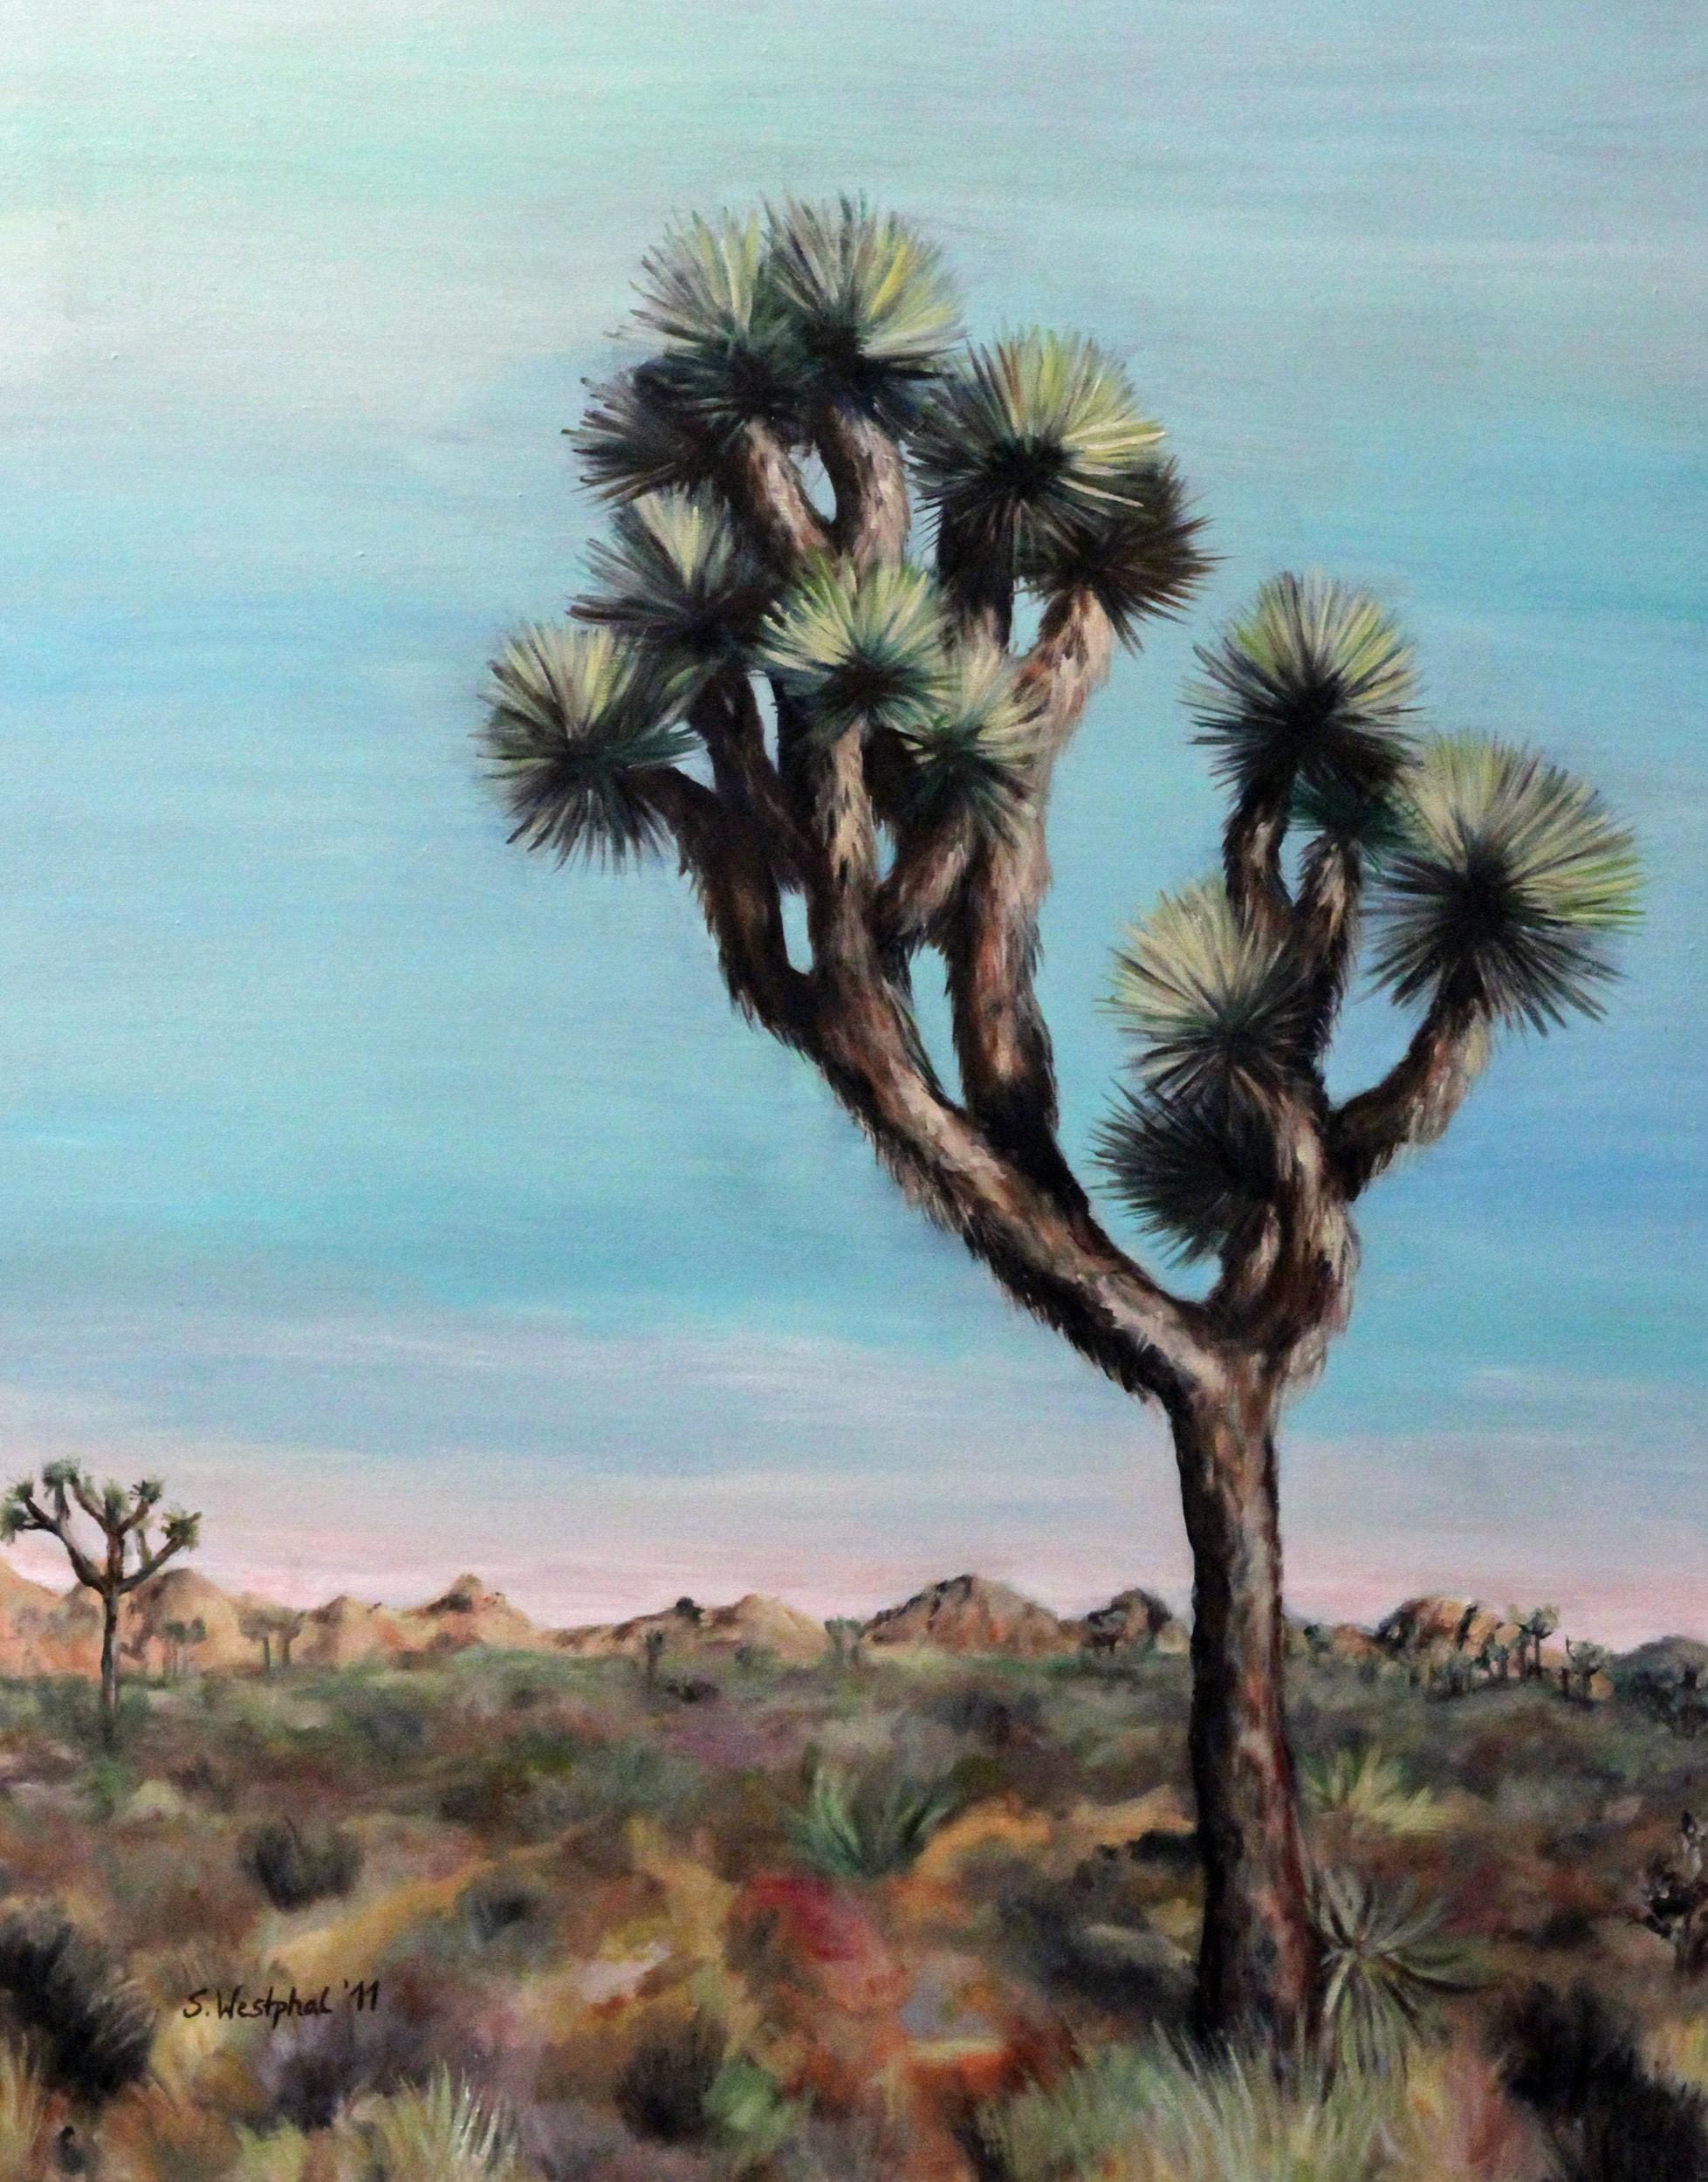 Joshua Tree | Malerei von Künstlerin Simone Westphal, Öl auf Leinwand